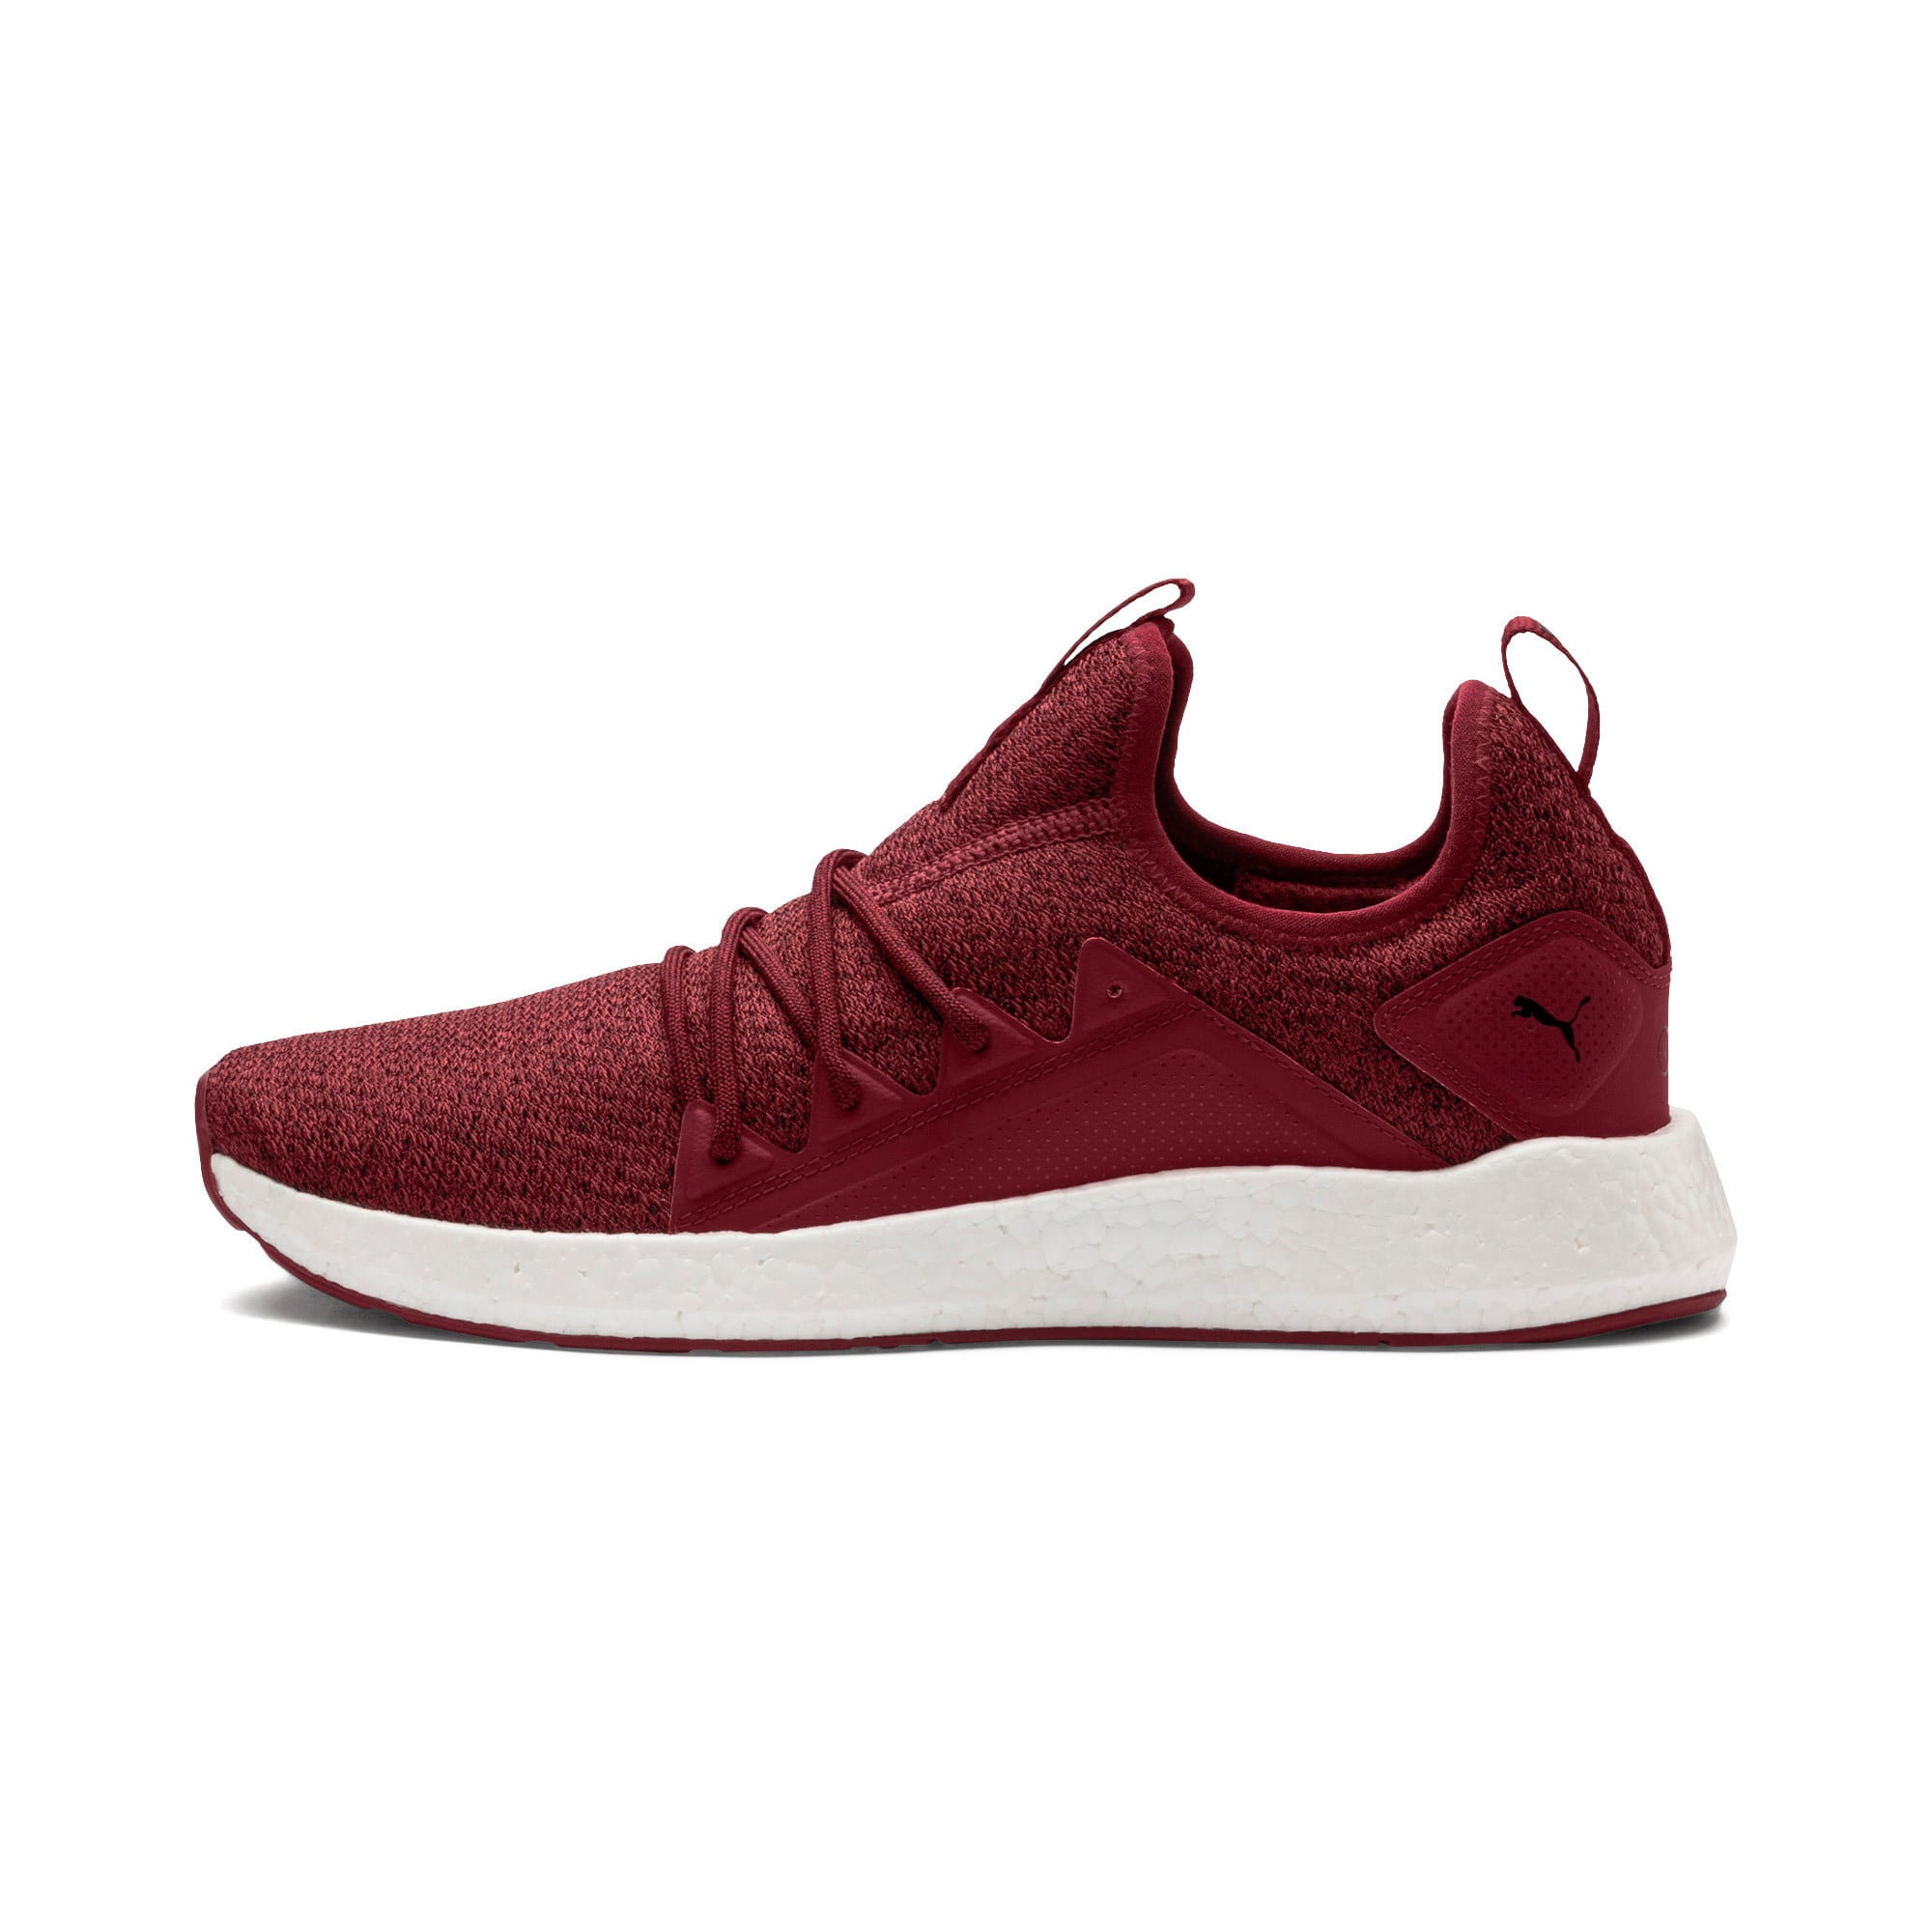 Thumbnail 1 of NRGY Neko Knit Men's Running Shoes, Pomegranate-Puma Black, medium